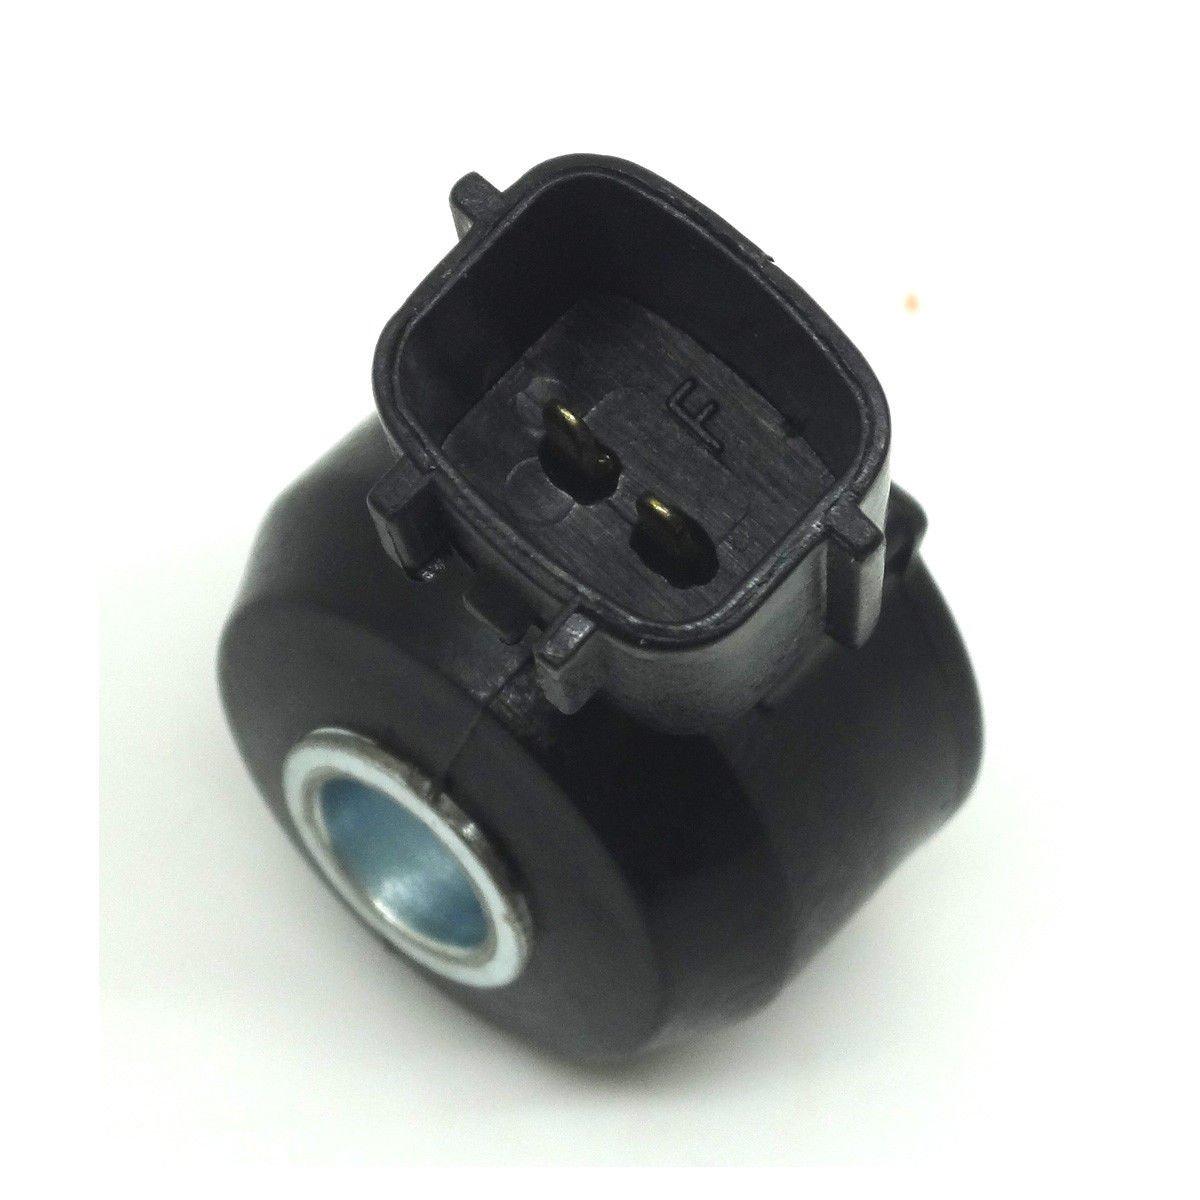 AMSAMOTION New Knock Sensor Nissan Frontier//Xterra // Pathfinder 1999-2003 22060-7B000 Mercury Villager Nissan Frontier 2002-1999 2004-1999